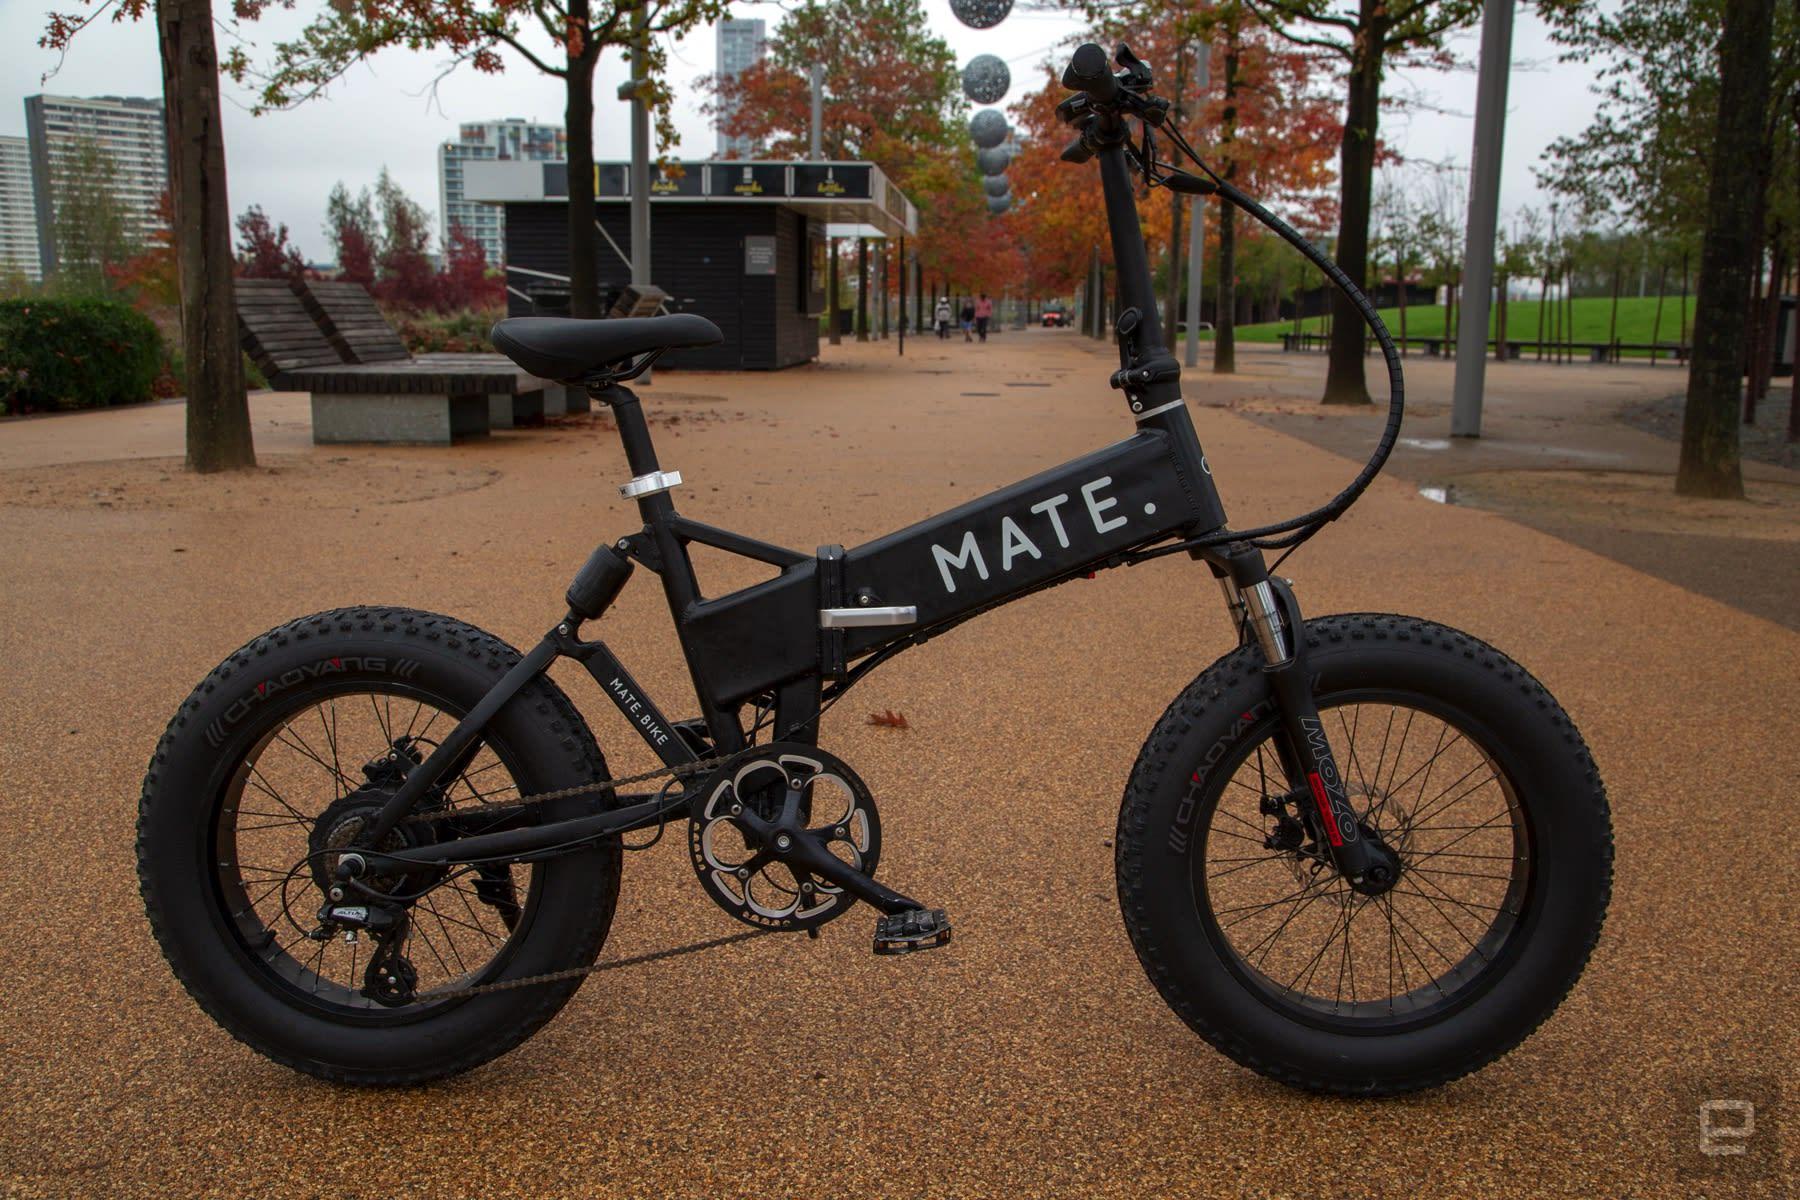 Mate X electric bike